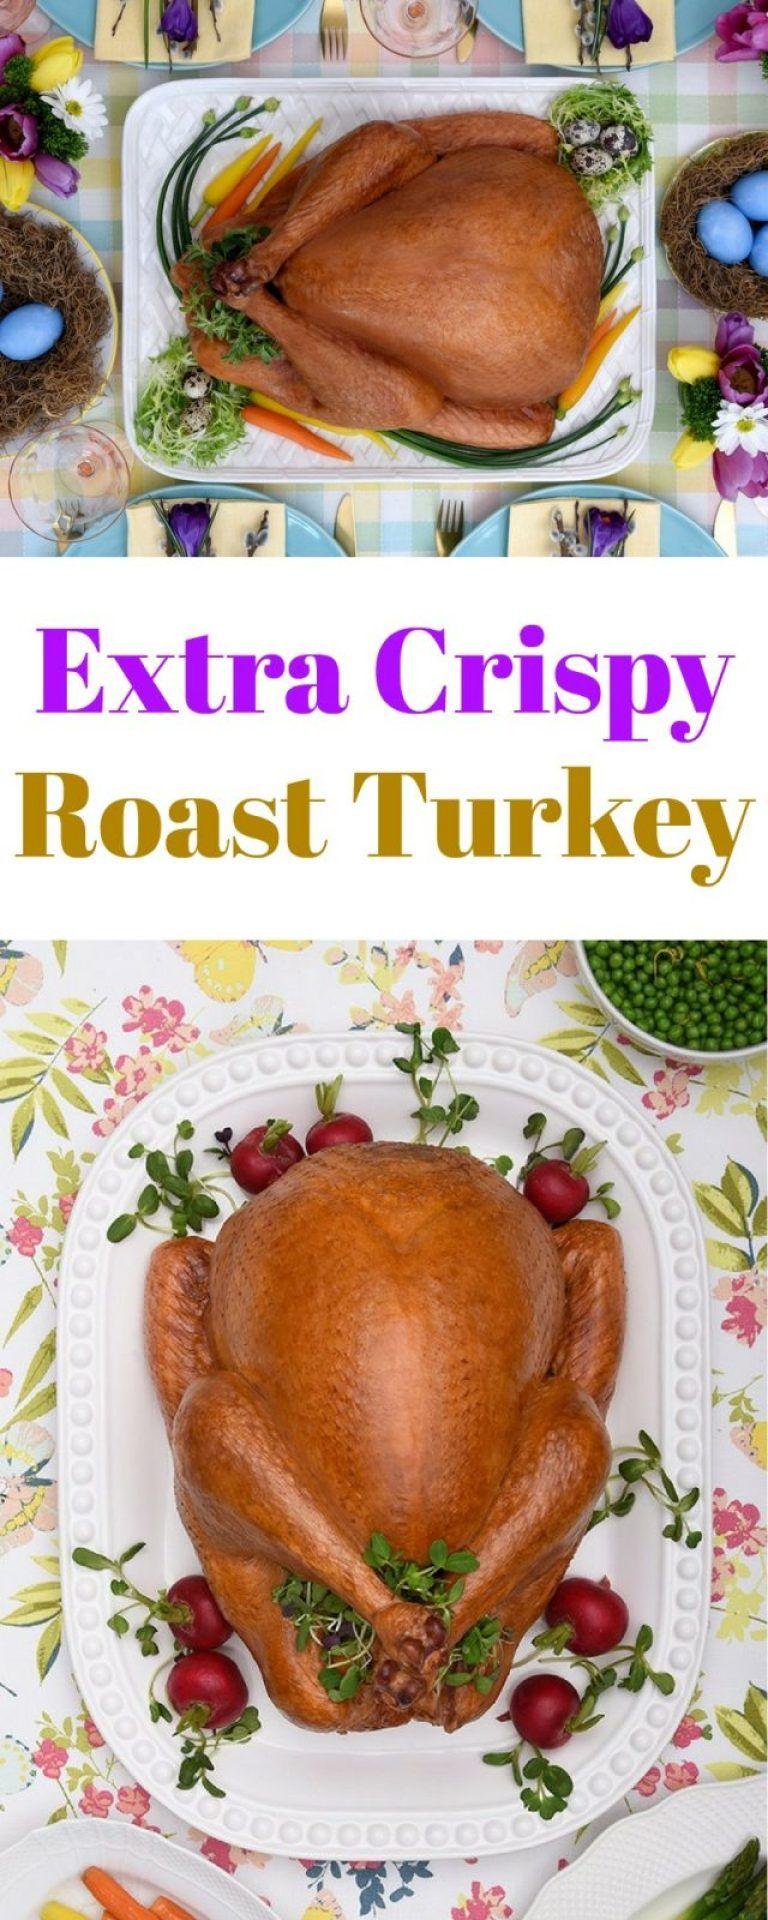 Crispy Roast Turkey Recipe Ottawa Mommy Club Recipe in